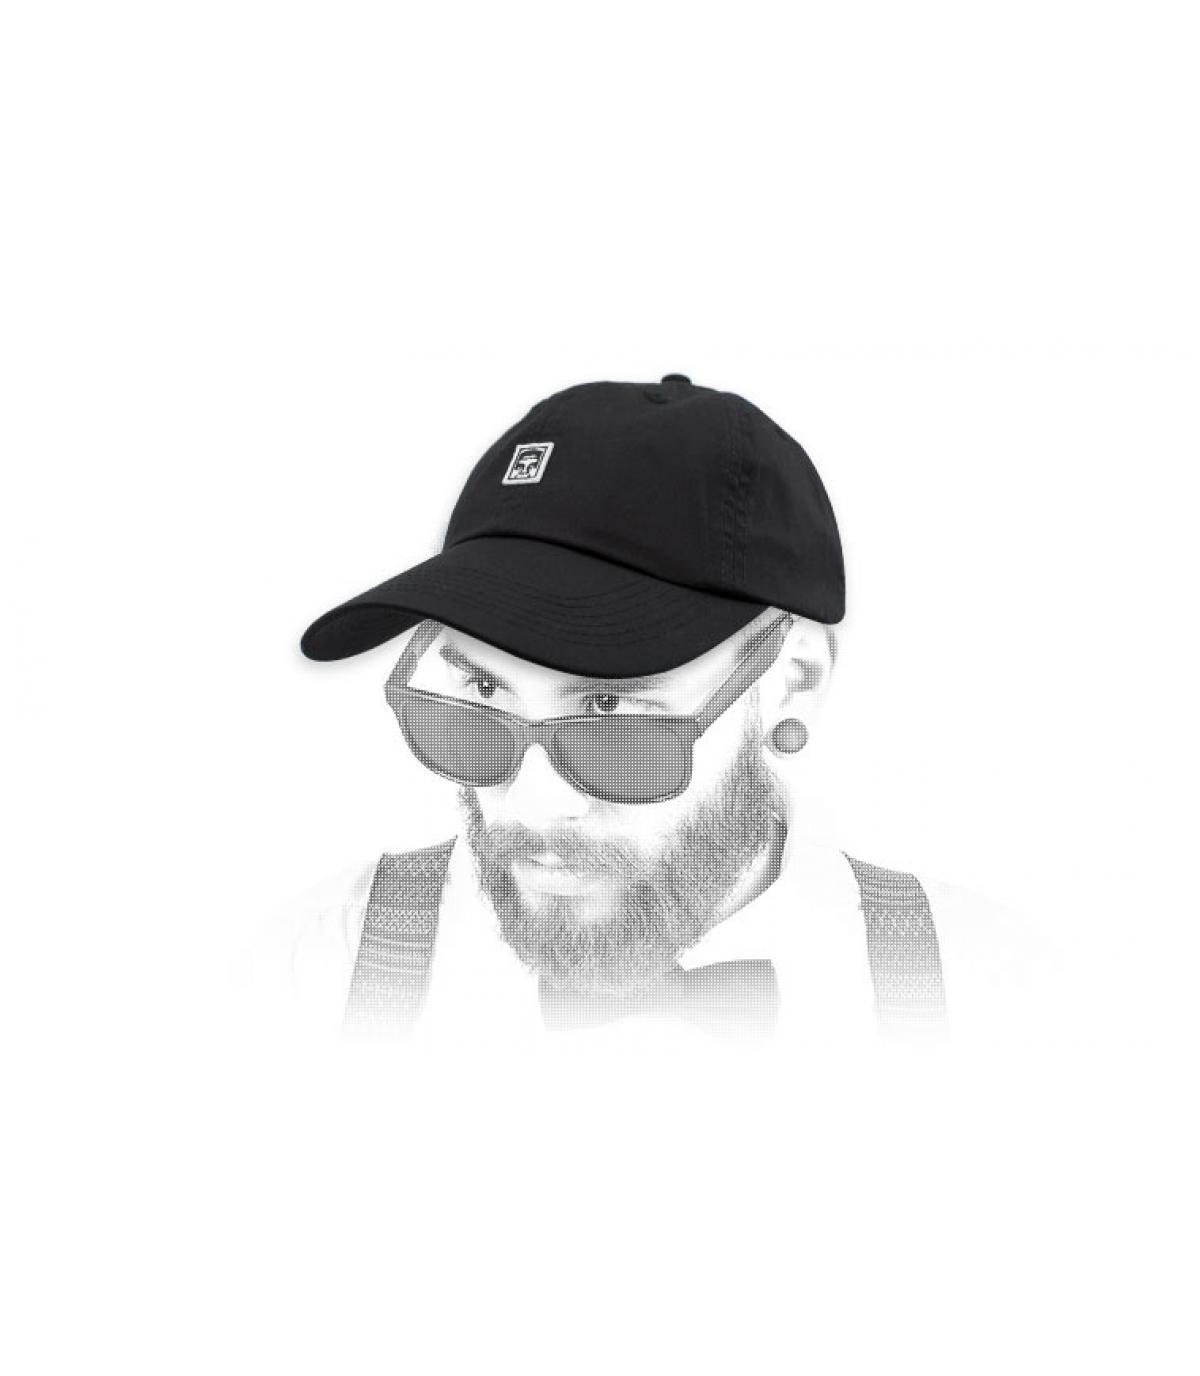 gorra negro Obey gigante